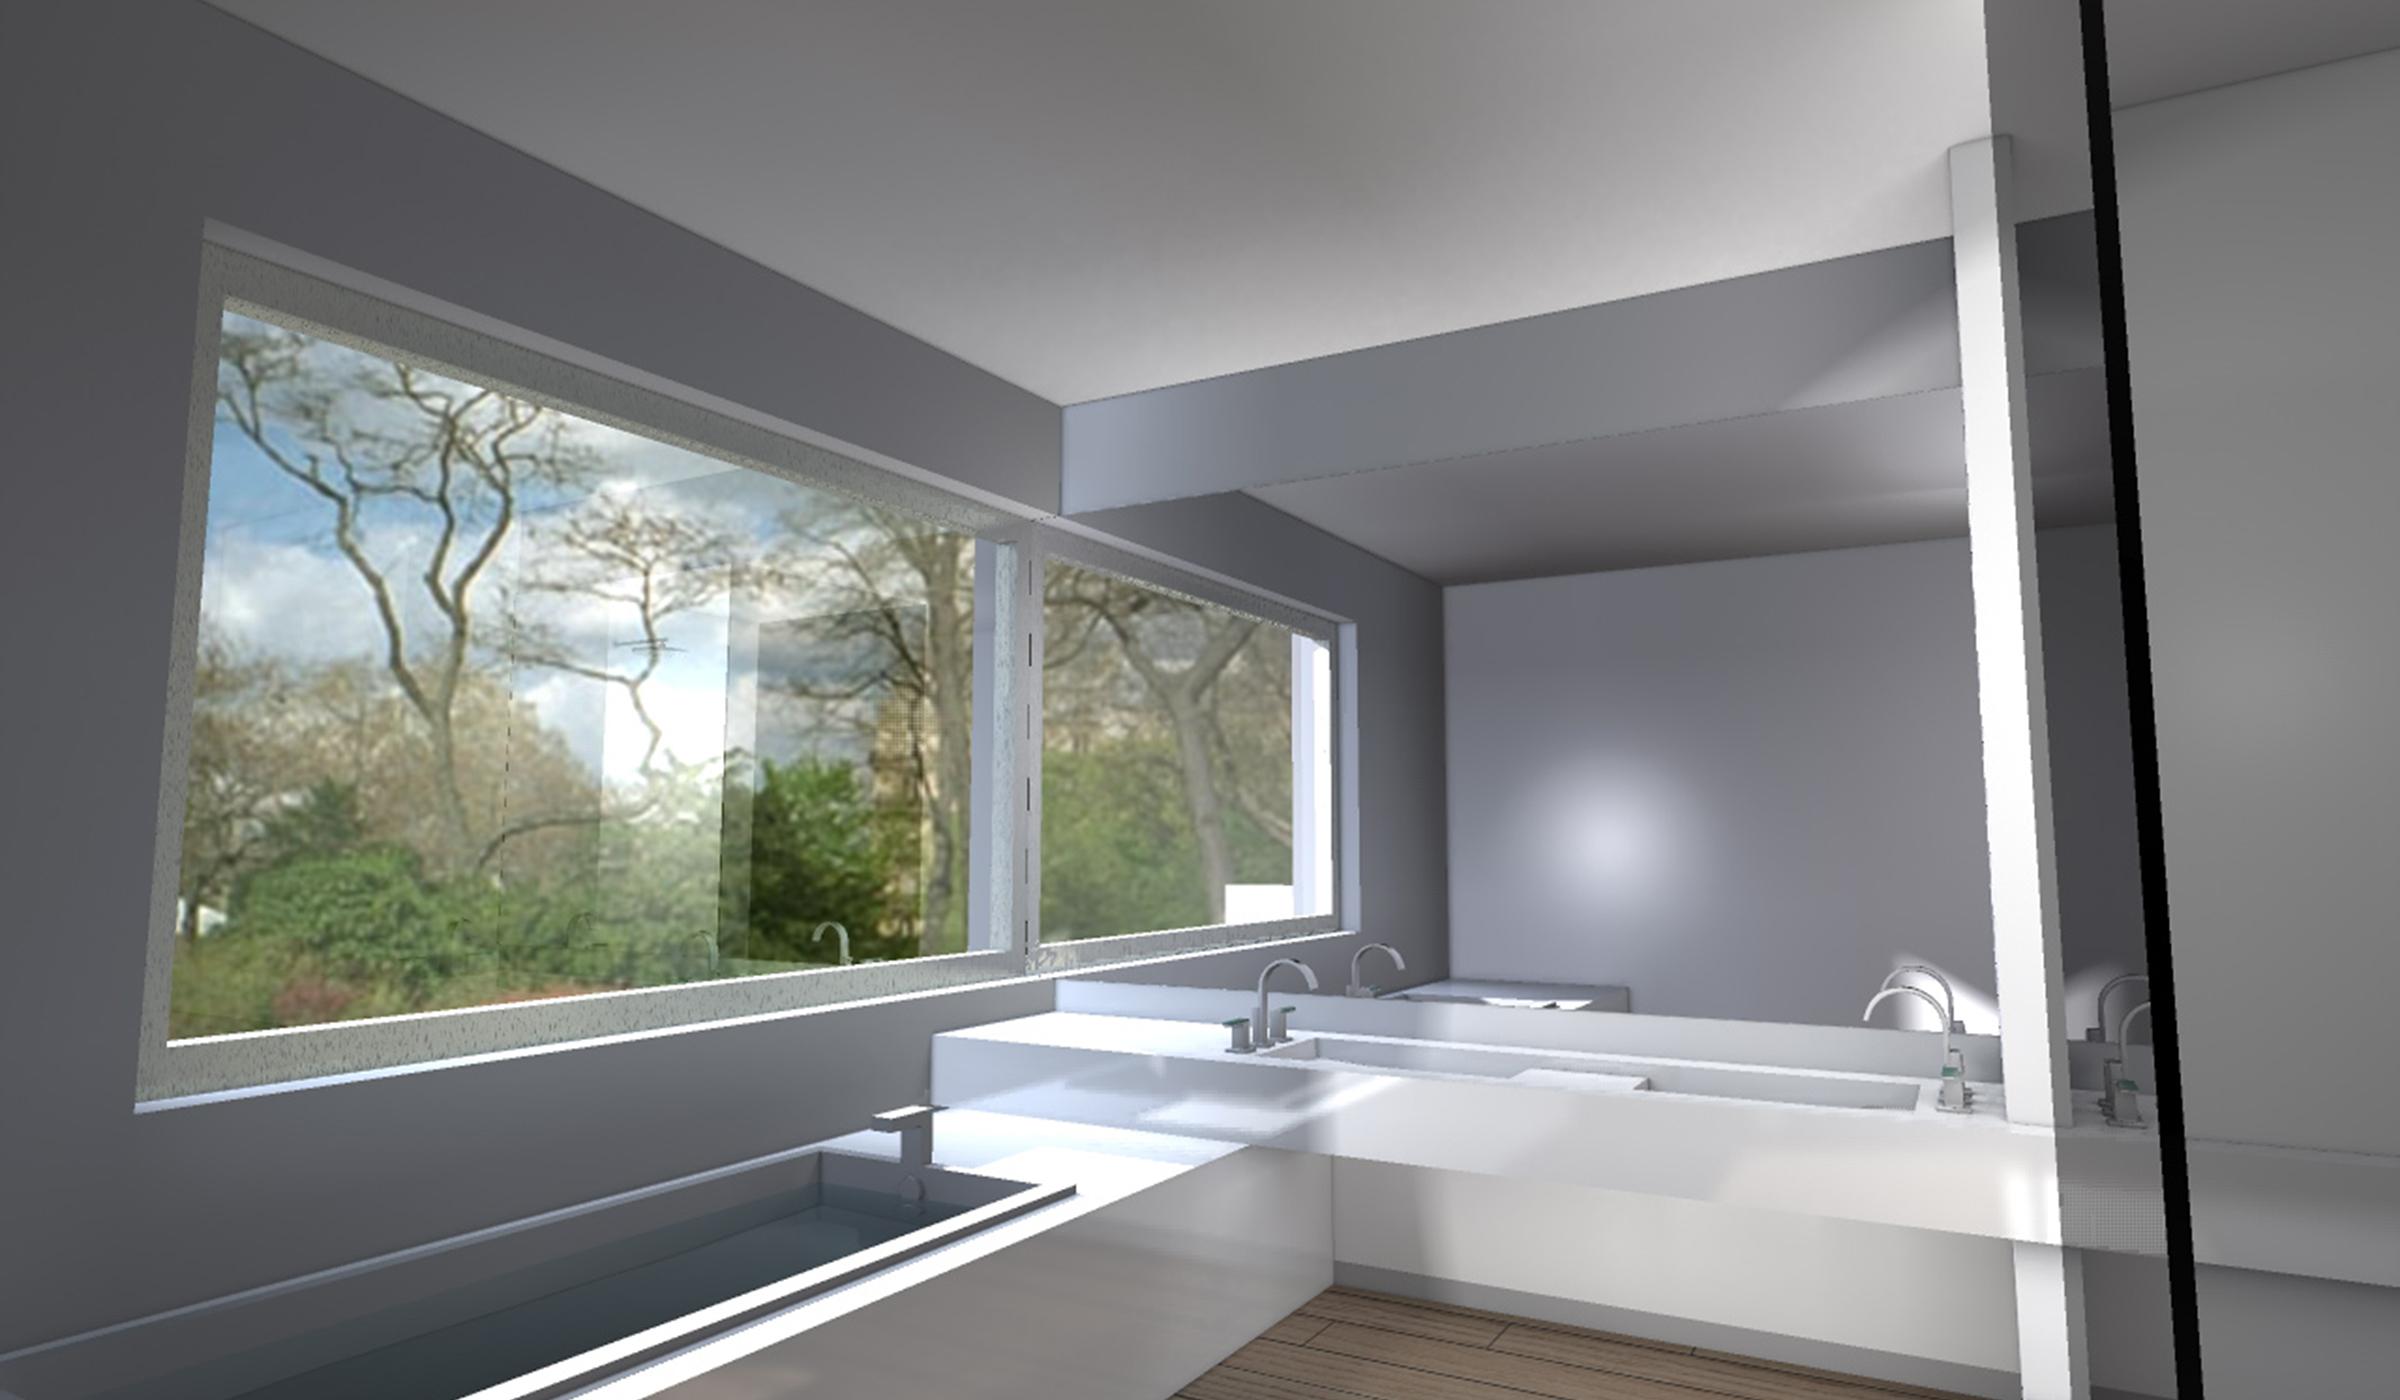 mikado mouvaux 59 france guillaume da silva. Black Bedroom Furniture Sets. Home Design Ideas